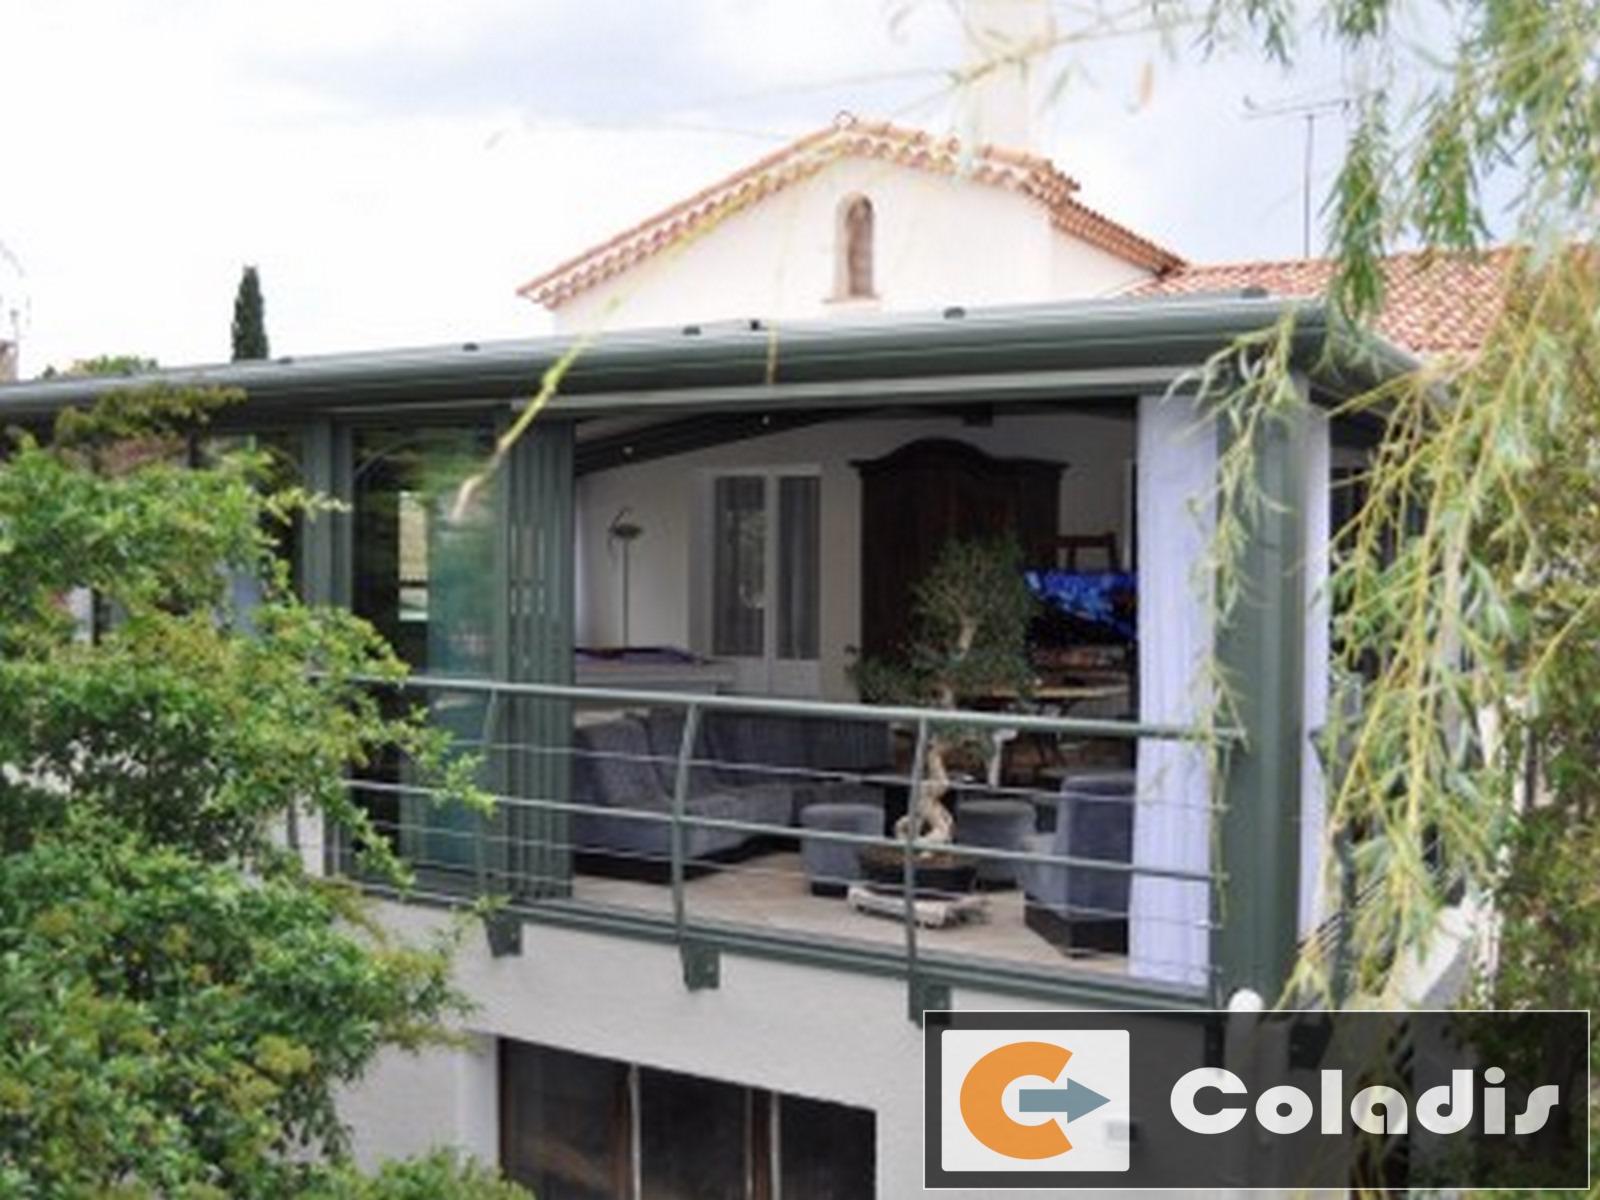 Installateur De Veranda Isolande En Aluminium Haut De Gamme Fabricant Poseur Mauguio Proche De Montpellier 34 Coladis